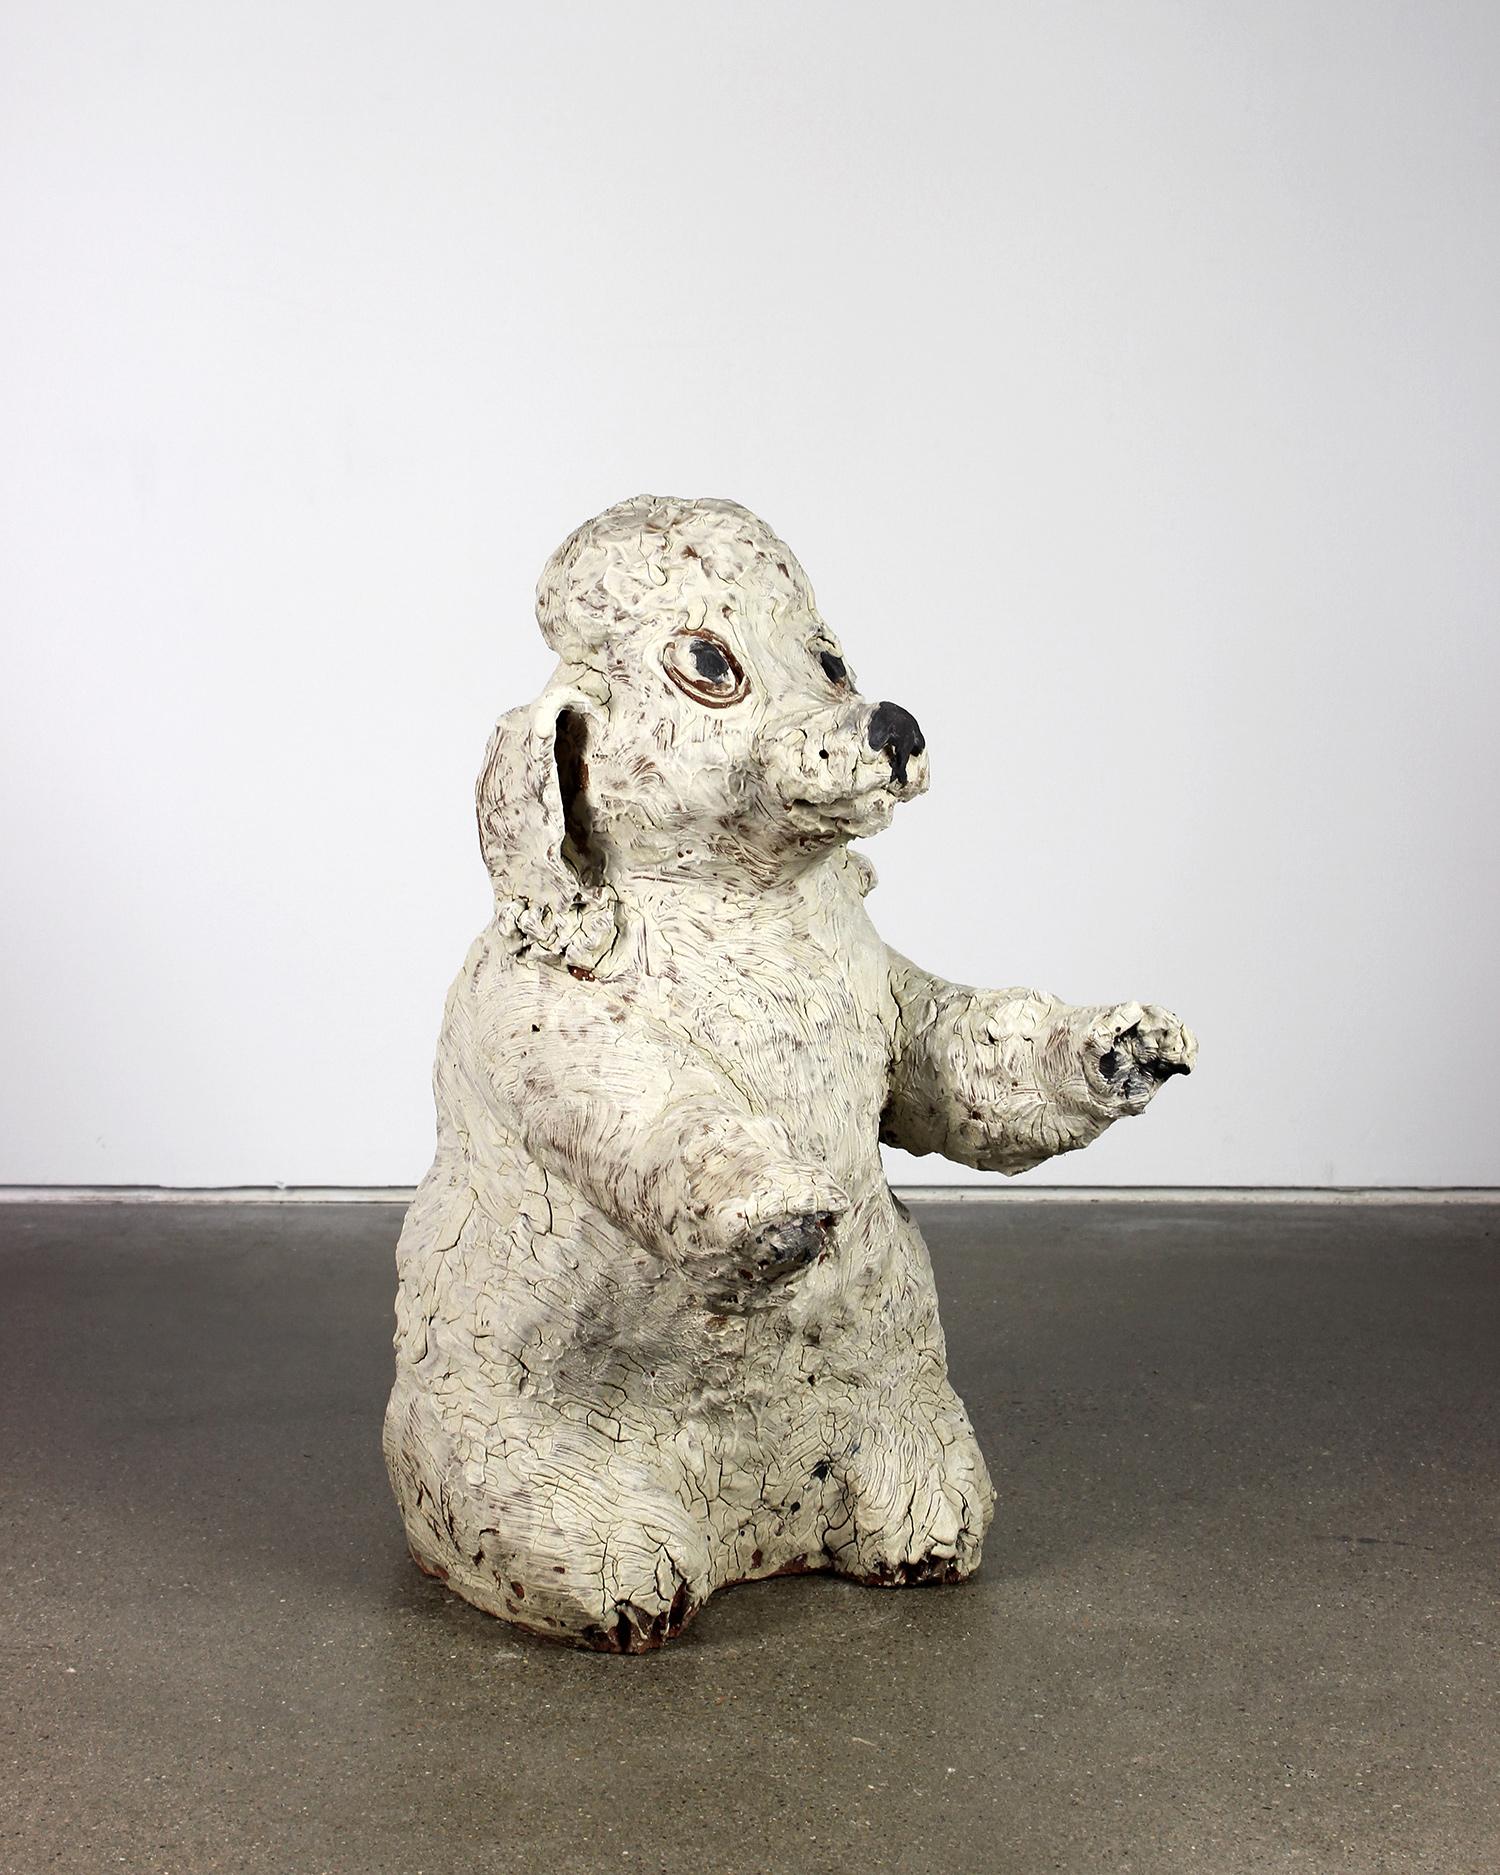 Kirk Mangus, Juneau (White Poodle), 1986